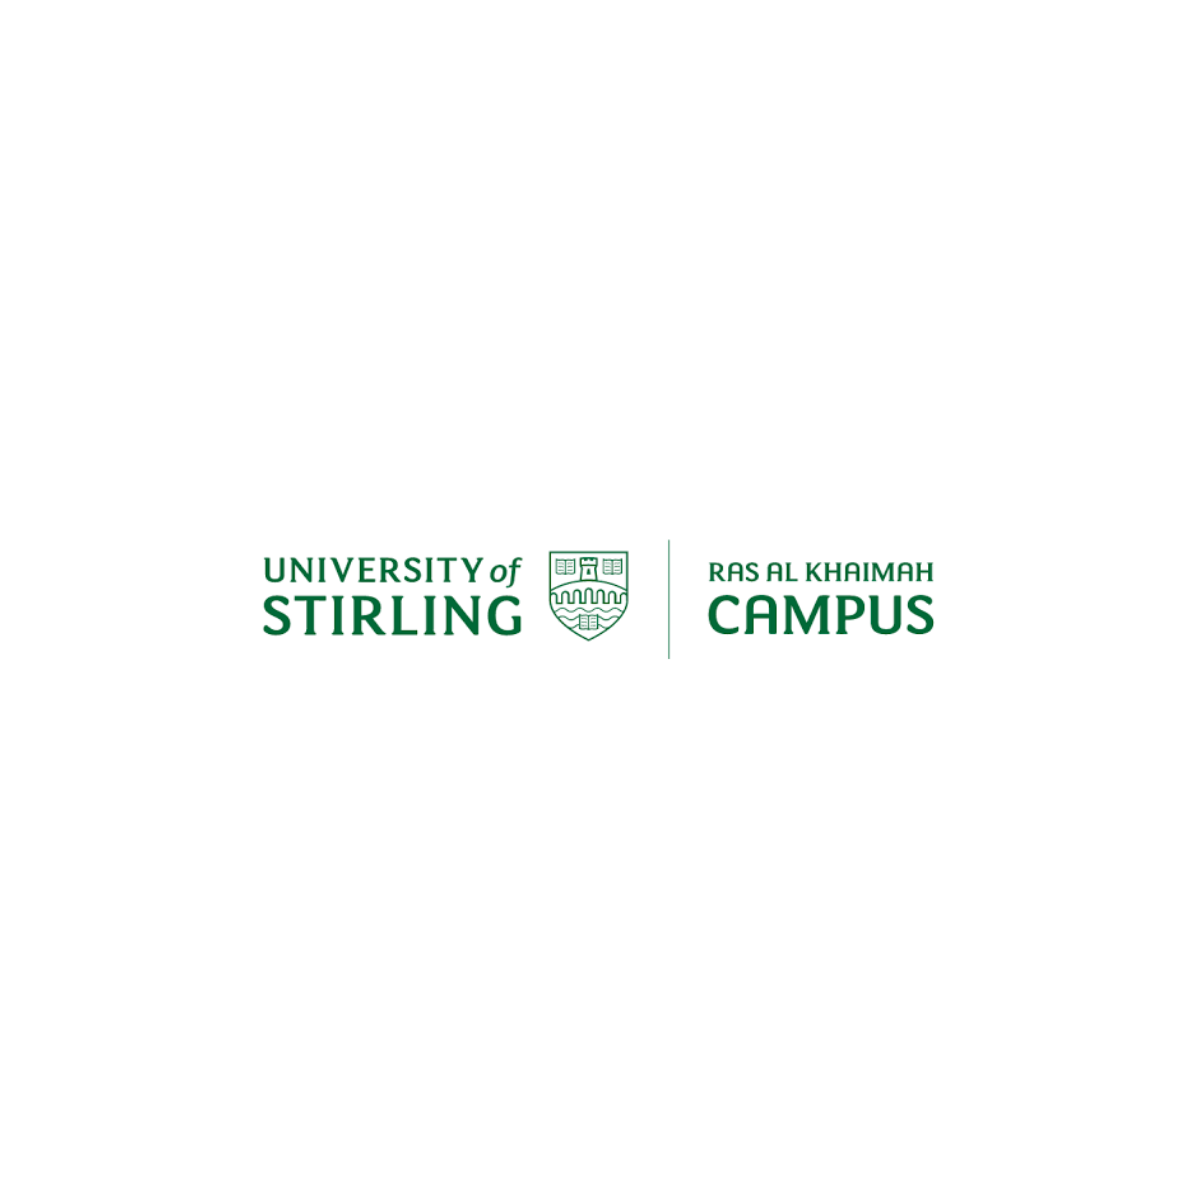 University of Stirling RAK Logo Image